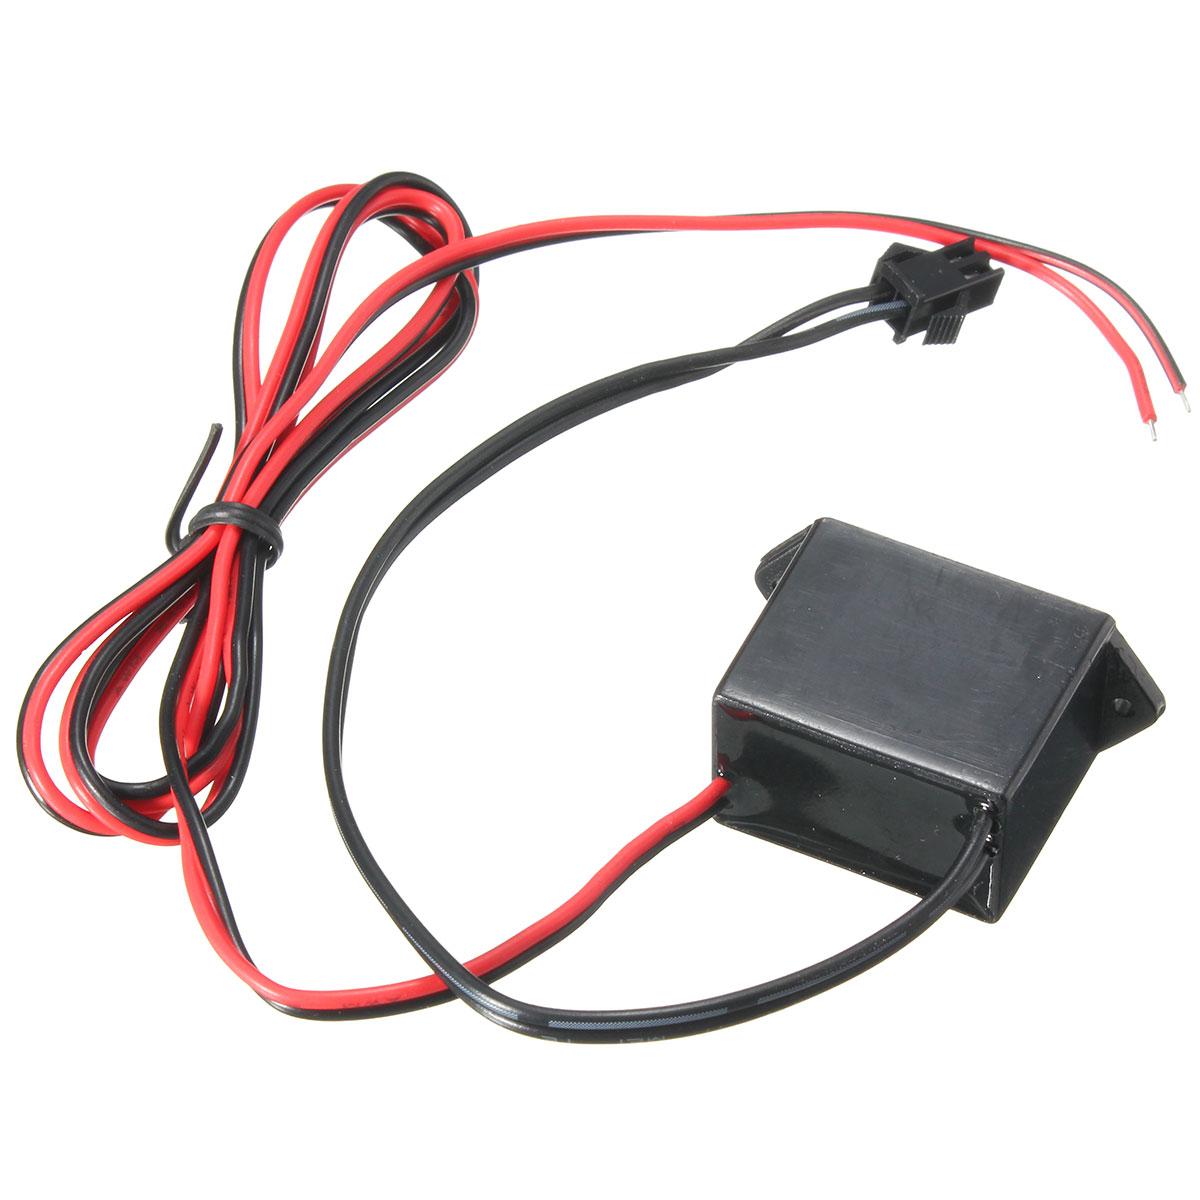 3V/12V Sound/Ordinary Battery Holder USB/Car Driver For EL Wire Neon ...